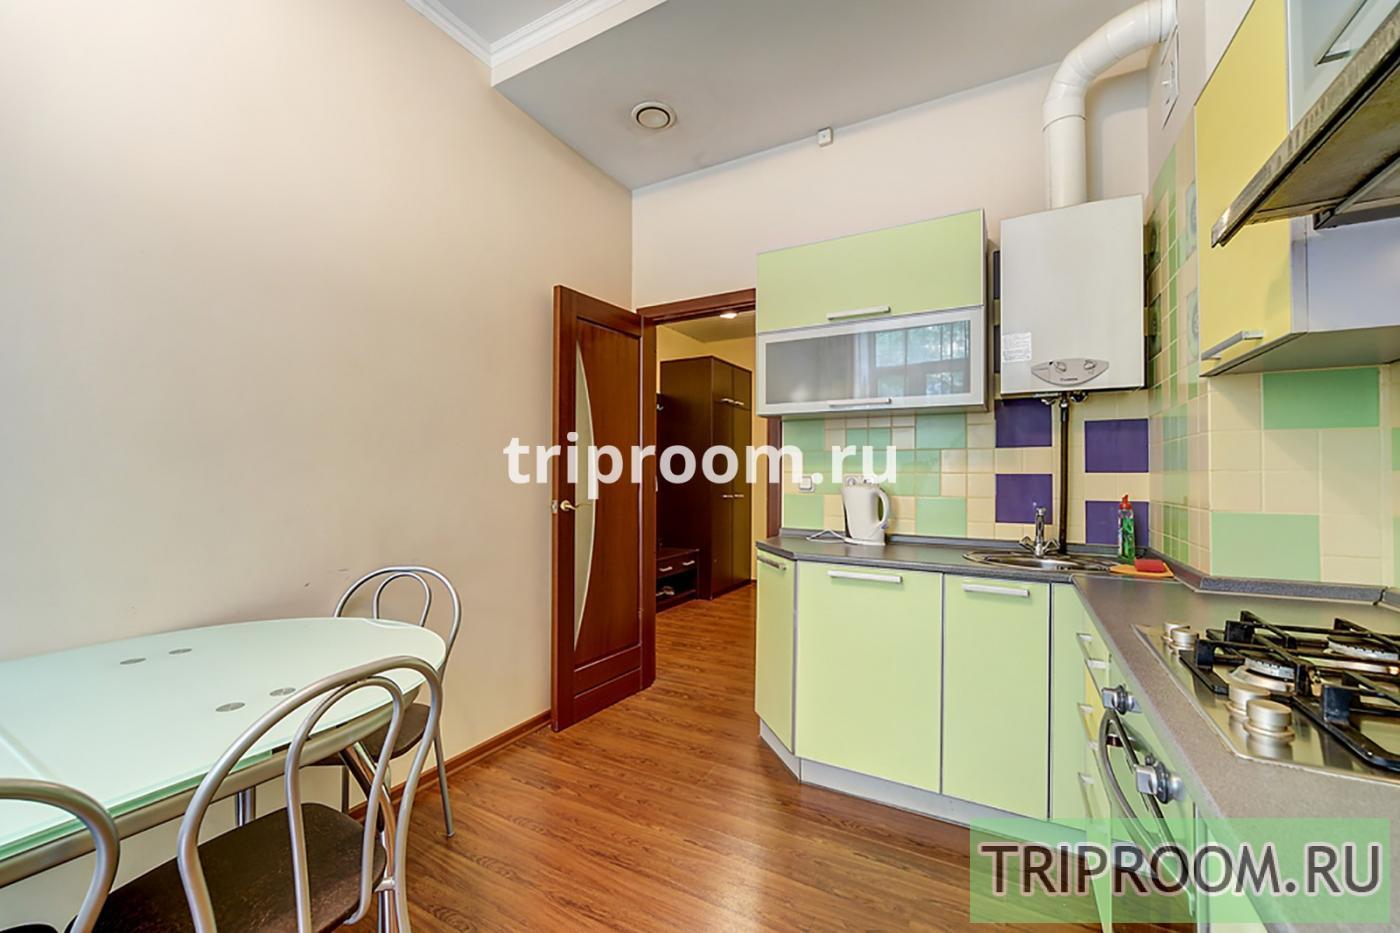 1-комнатная квартира посуточно (вариант № 15527), ул. Канала Грибоедова набережная, фото № 5